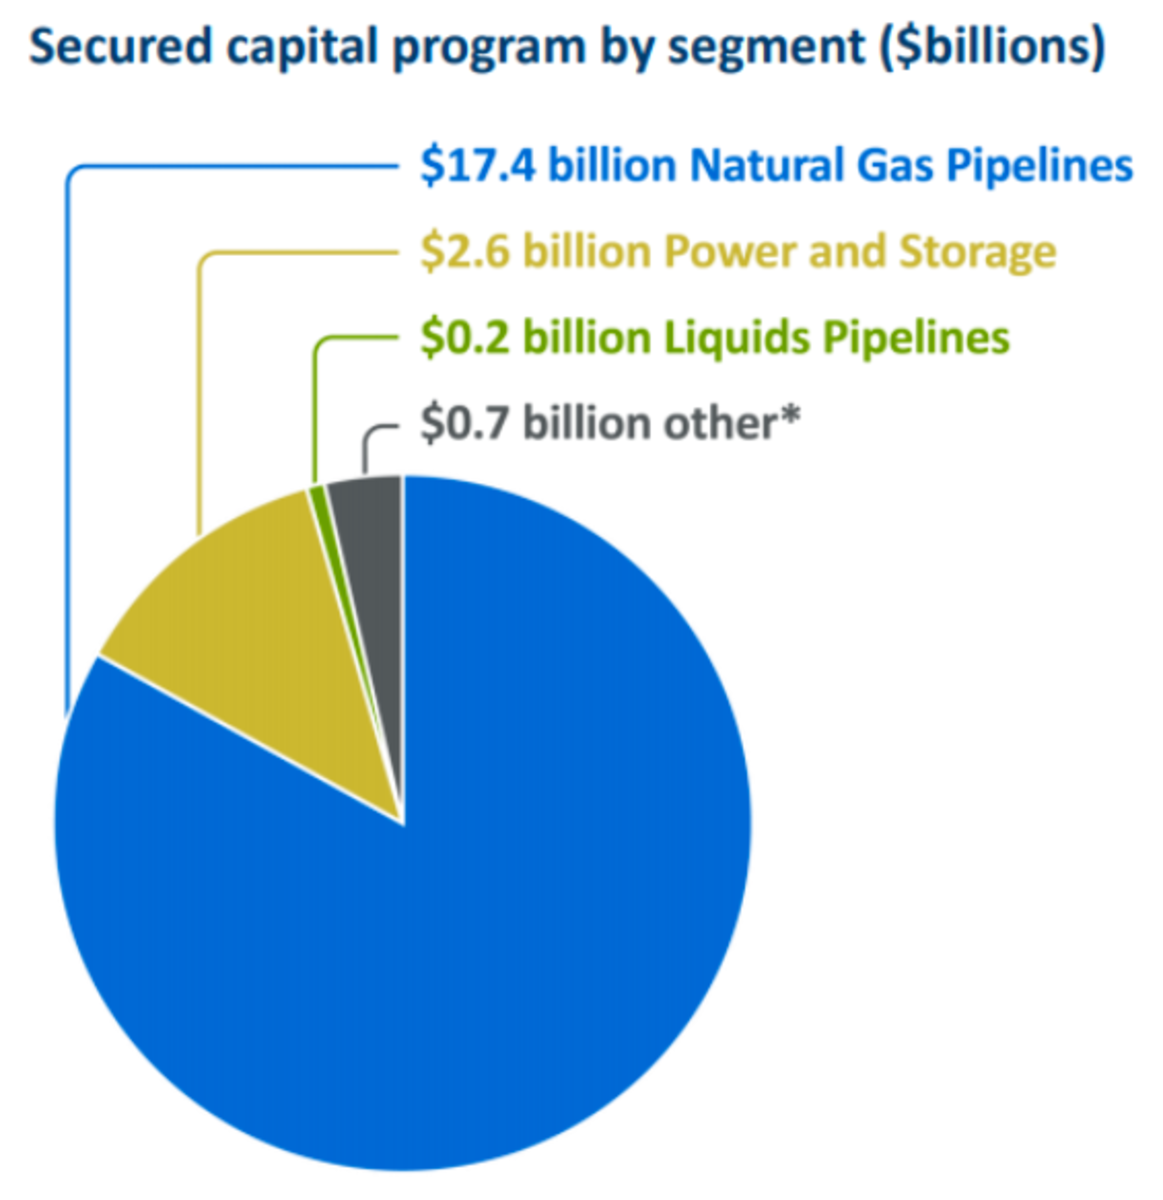 Source: TRP Q2 investors presentation